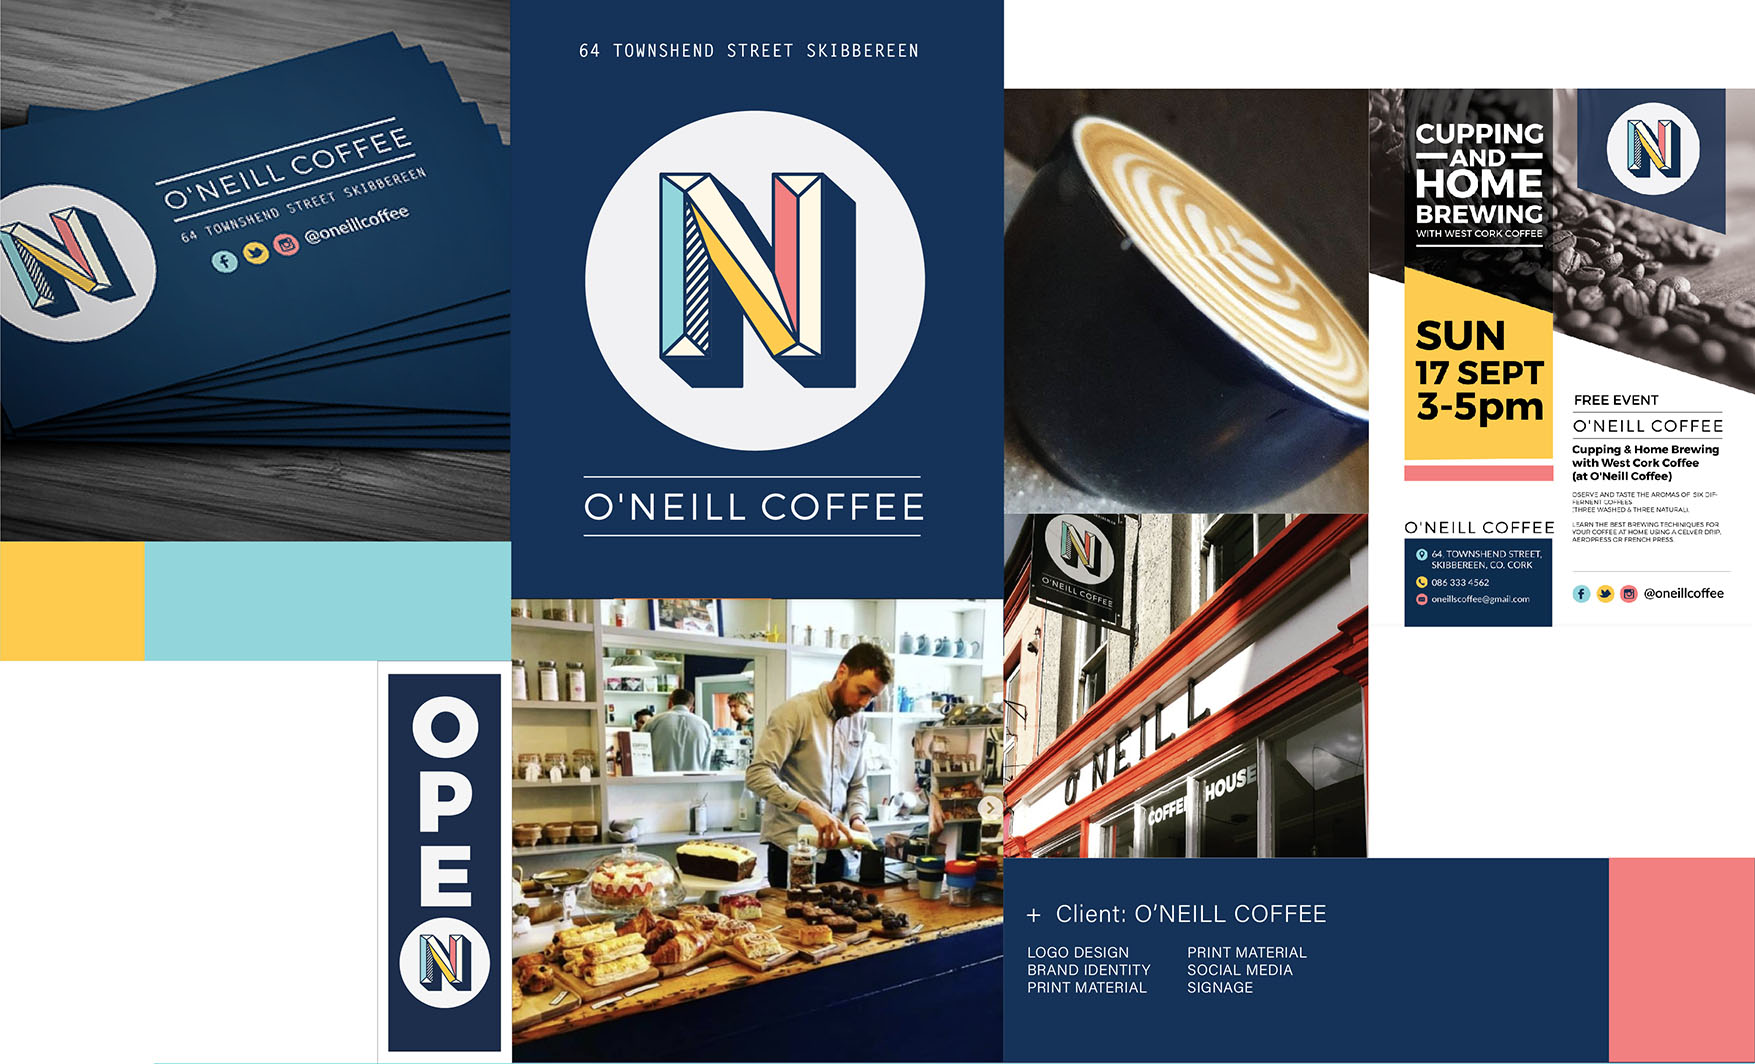 O'NEILL COFFEE